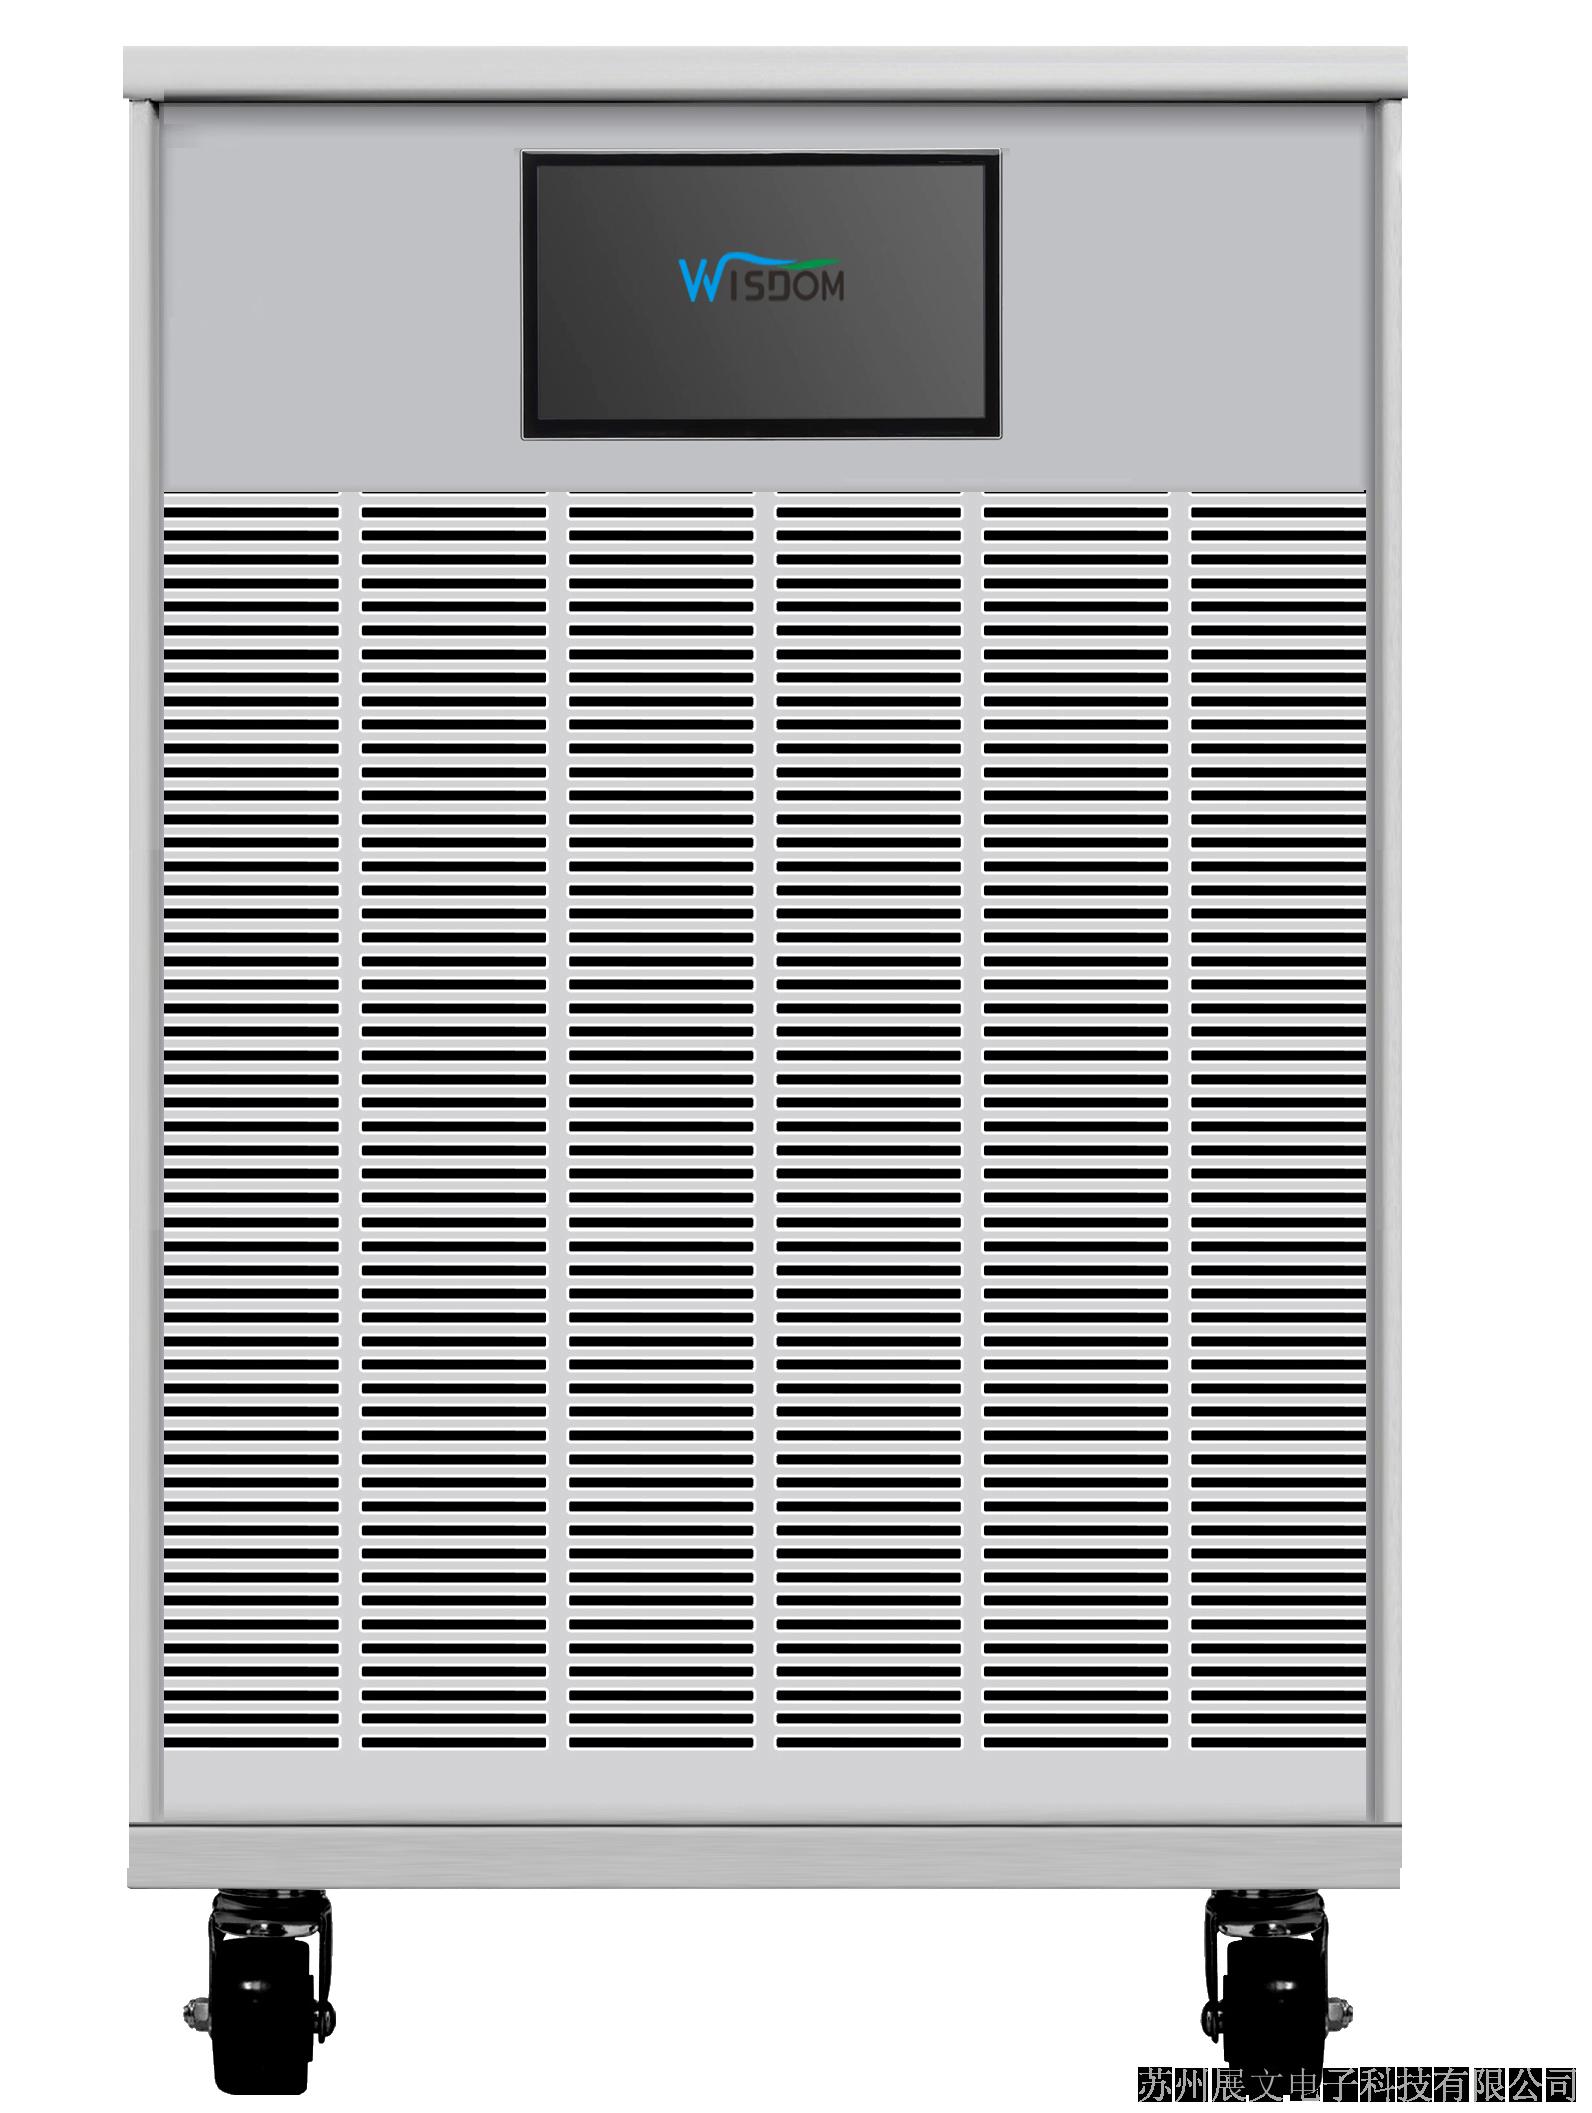 �Nw�Mw�}�����_w-nhr 94200 series可编程交直流多用电源 w-nhr 94200 series